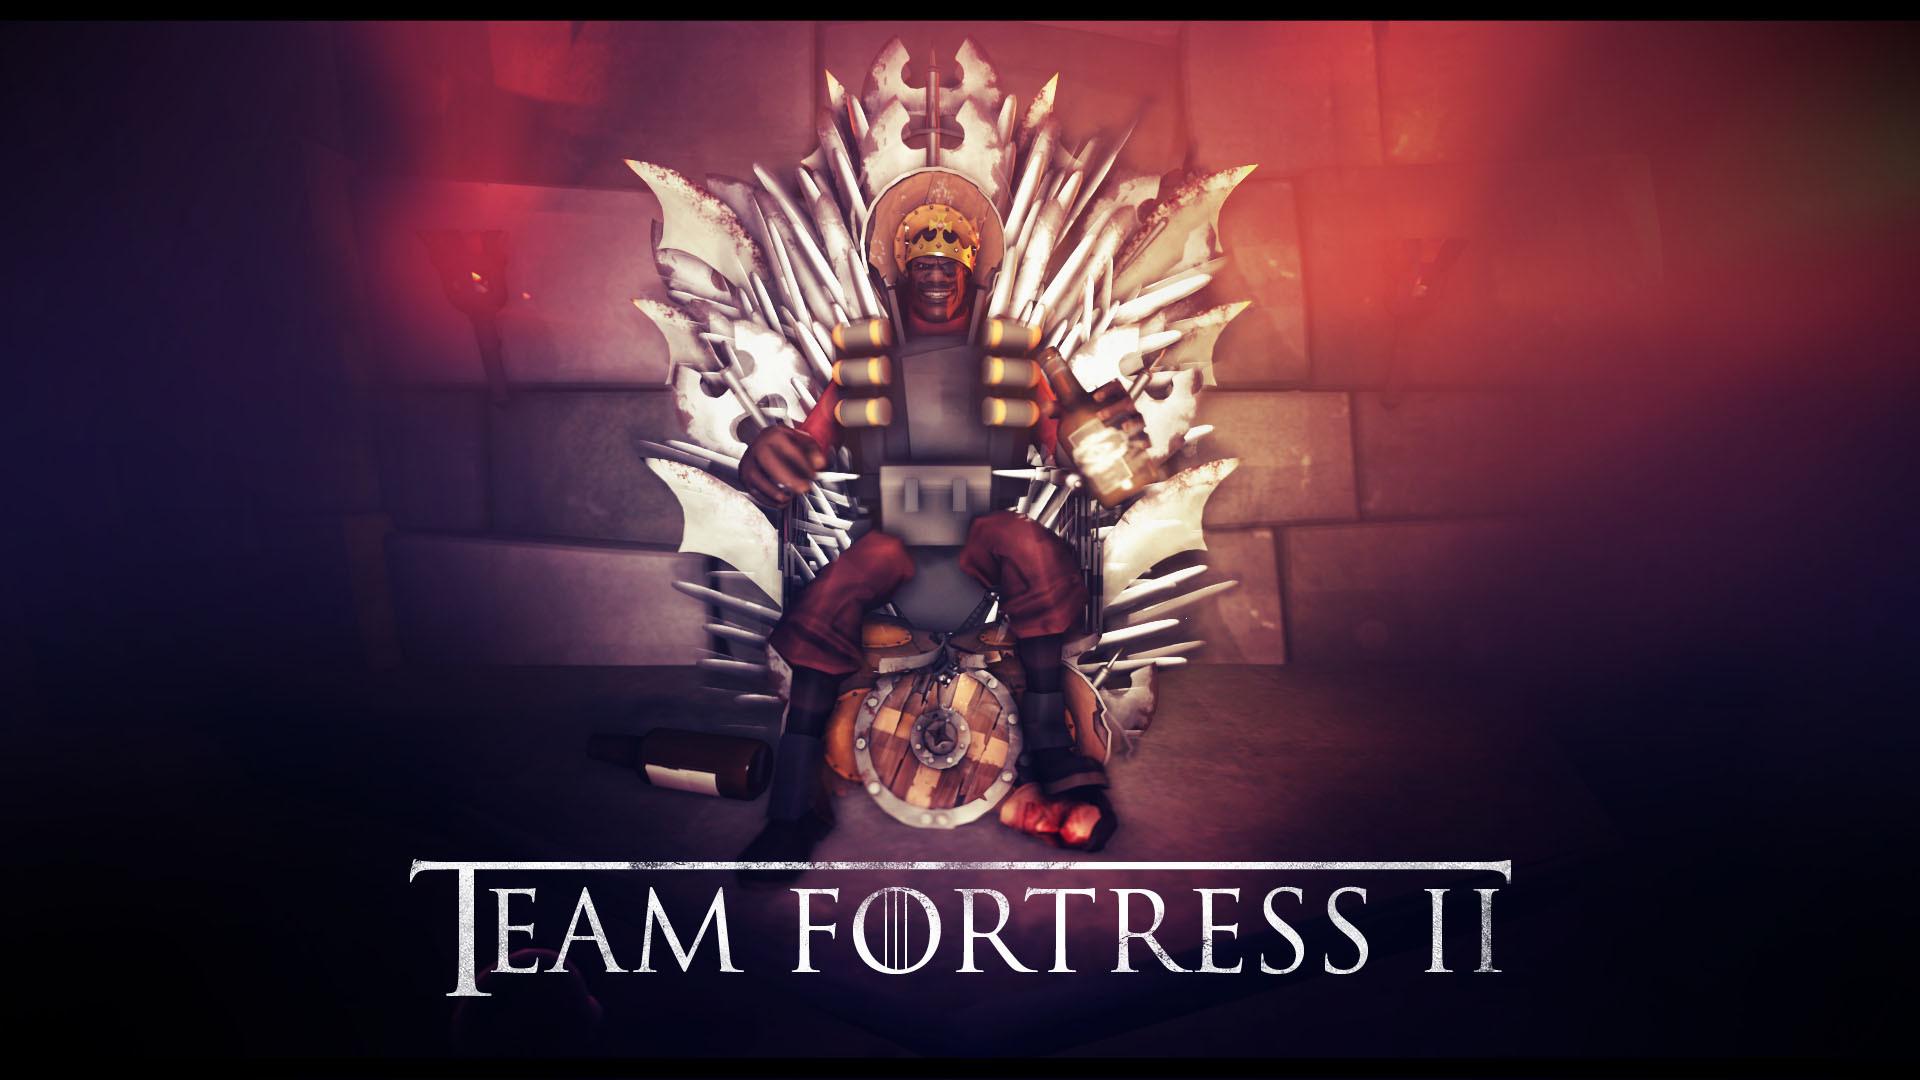 First SFM render: Game Of Thrones TF2 crossover [1920×1080]https://i.imgur.com/2Q6lhxq.jpg  …